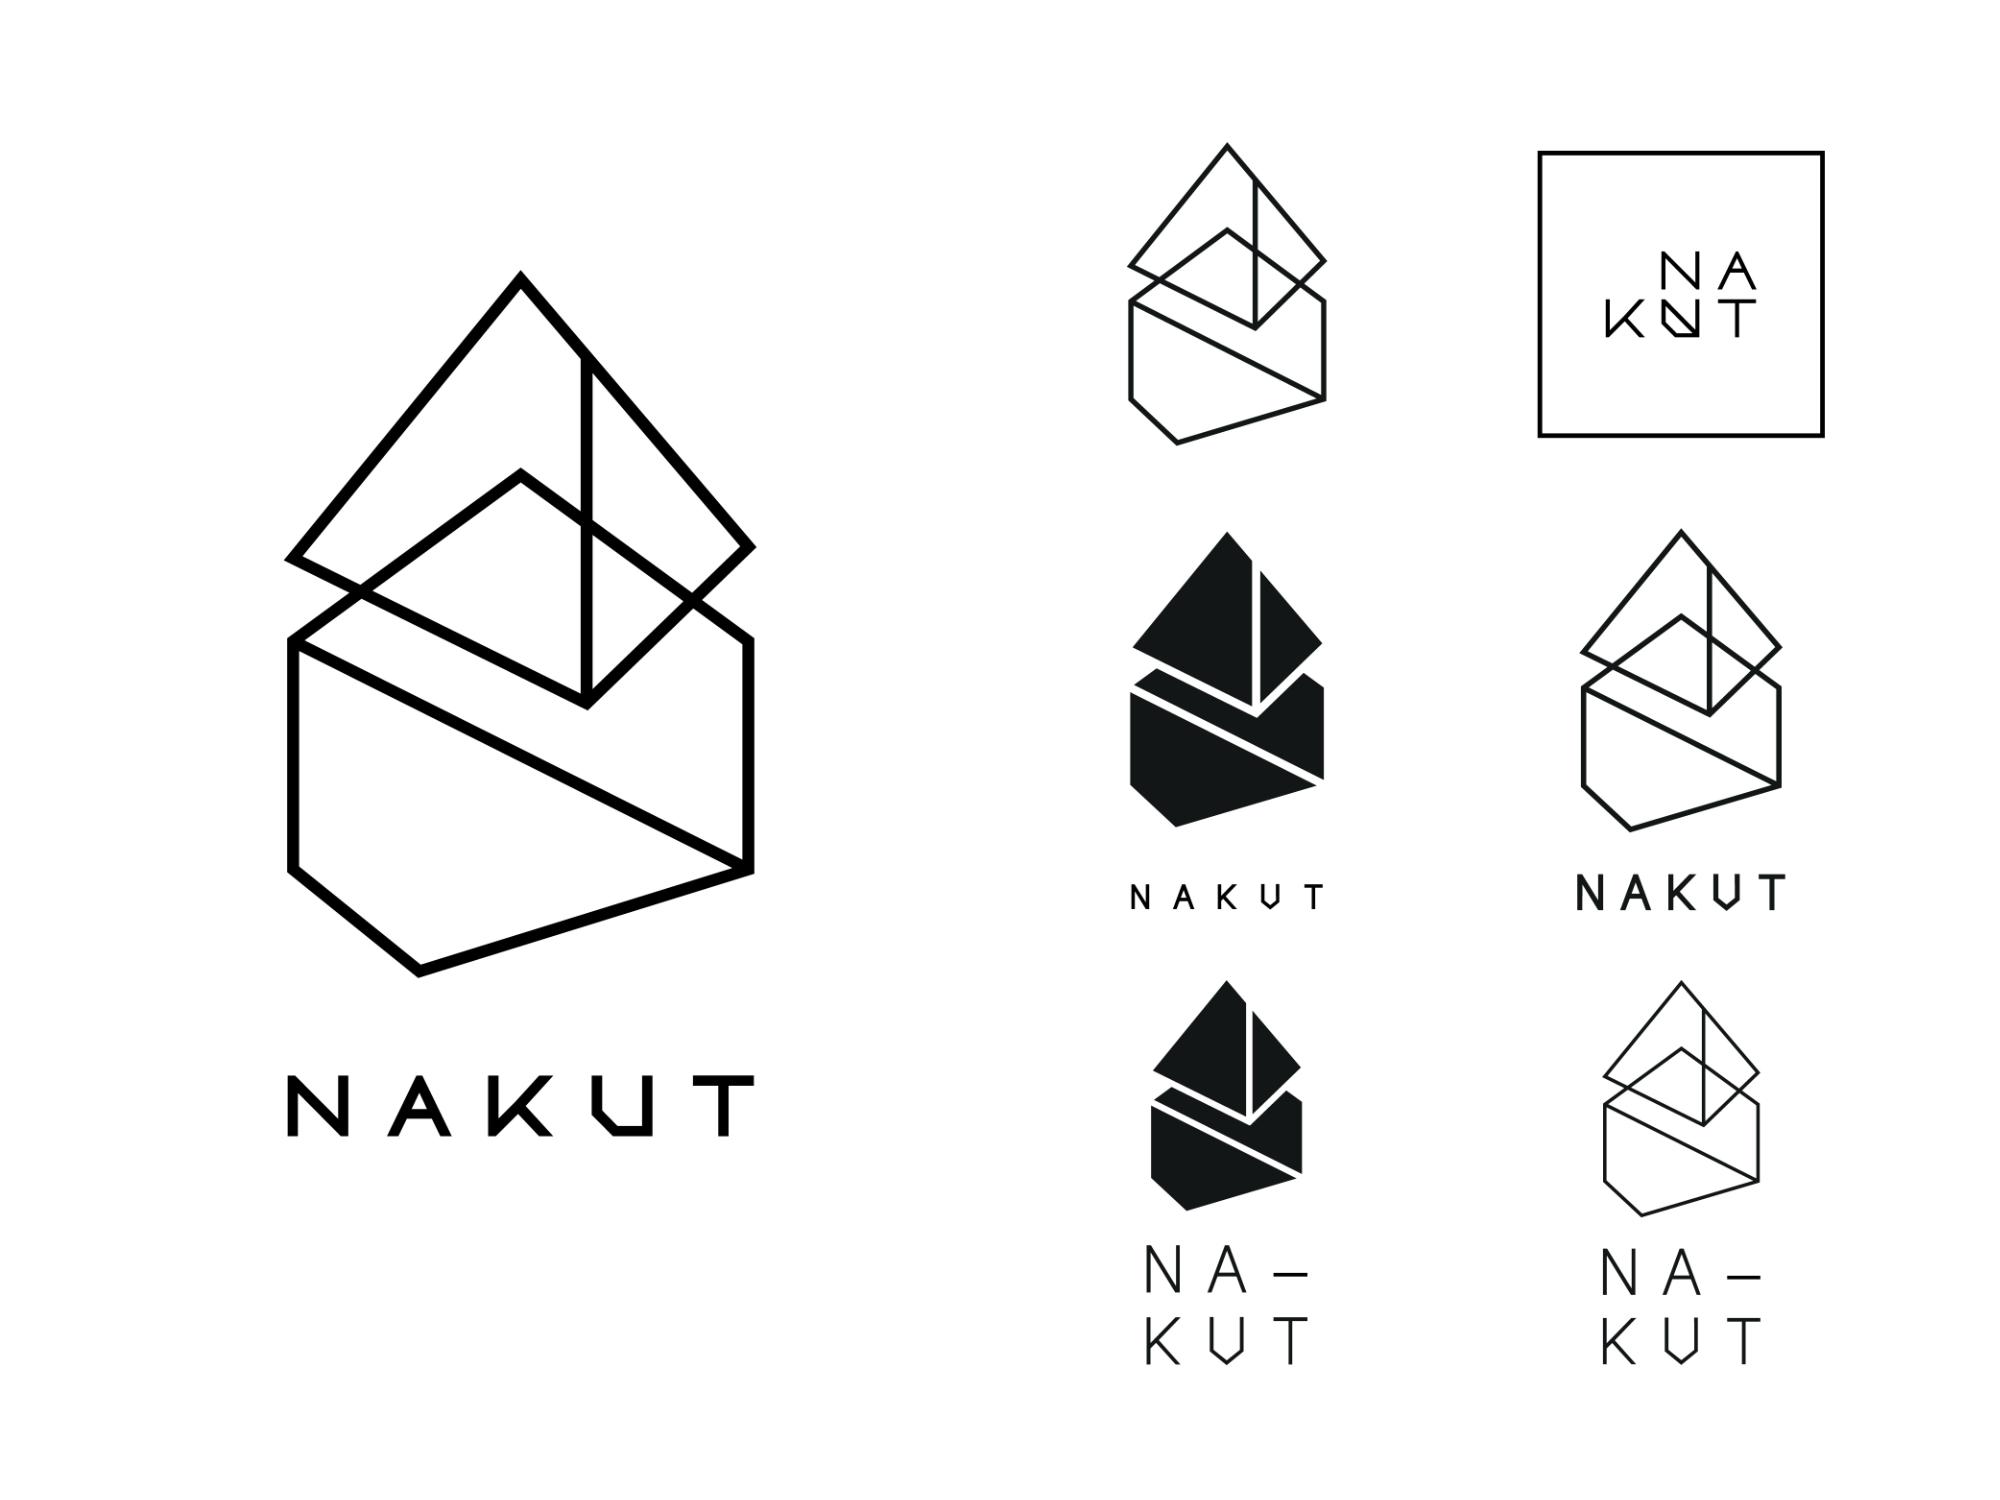 Nakut logo - Development